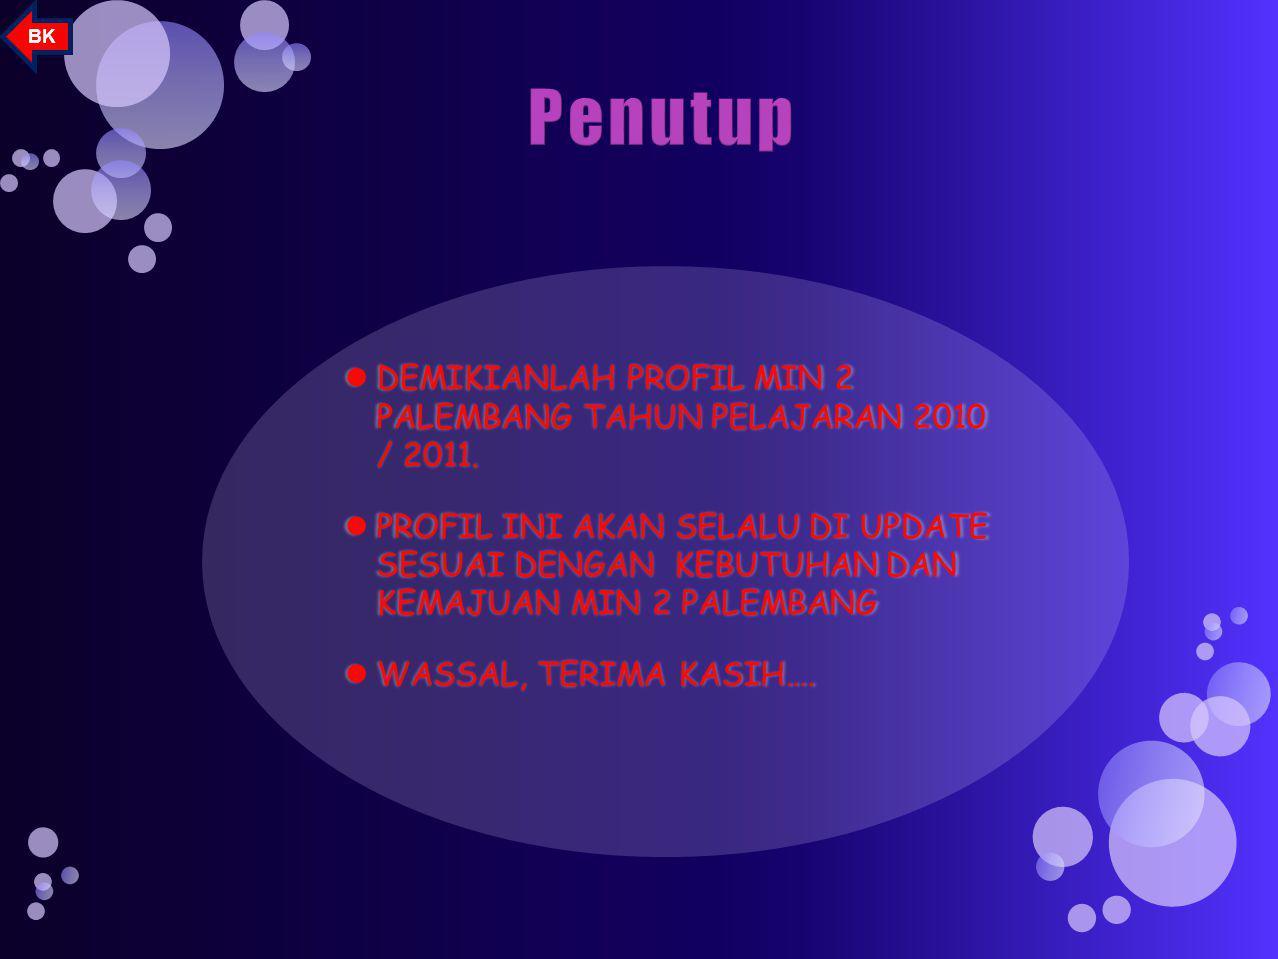 NoKegiatanNama Peserta 1. Juara I Lomba Mading Putra dalam Rangka HUT Pramuka Tahun 2009 Tk. Kota Palembang 1.M. Mukasyafah 2.M. Baiyan Ibnu Balkan 3.